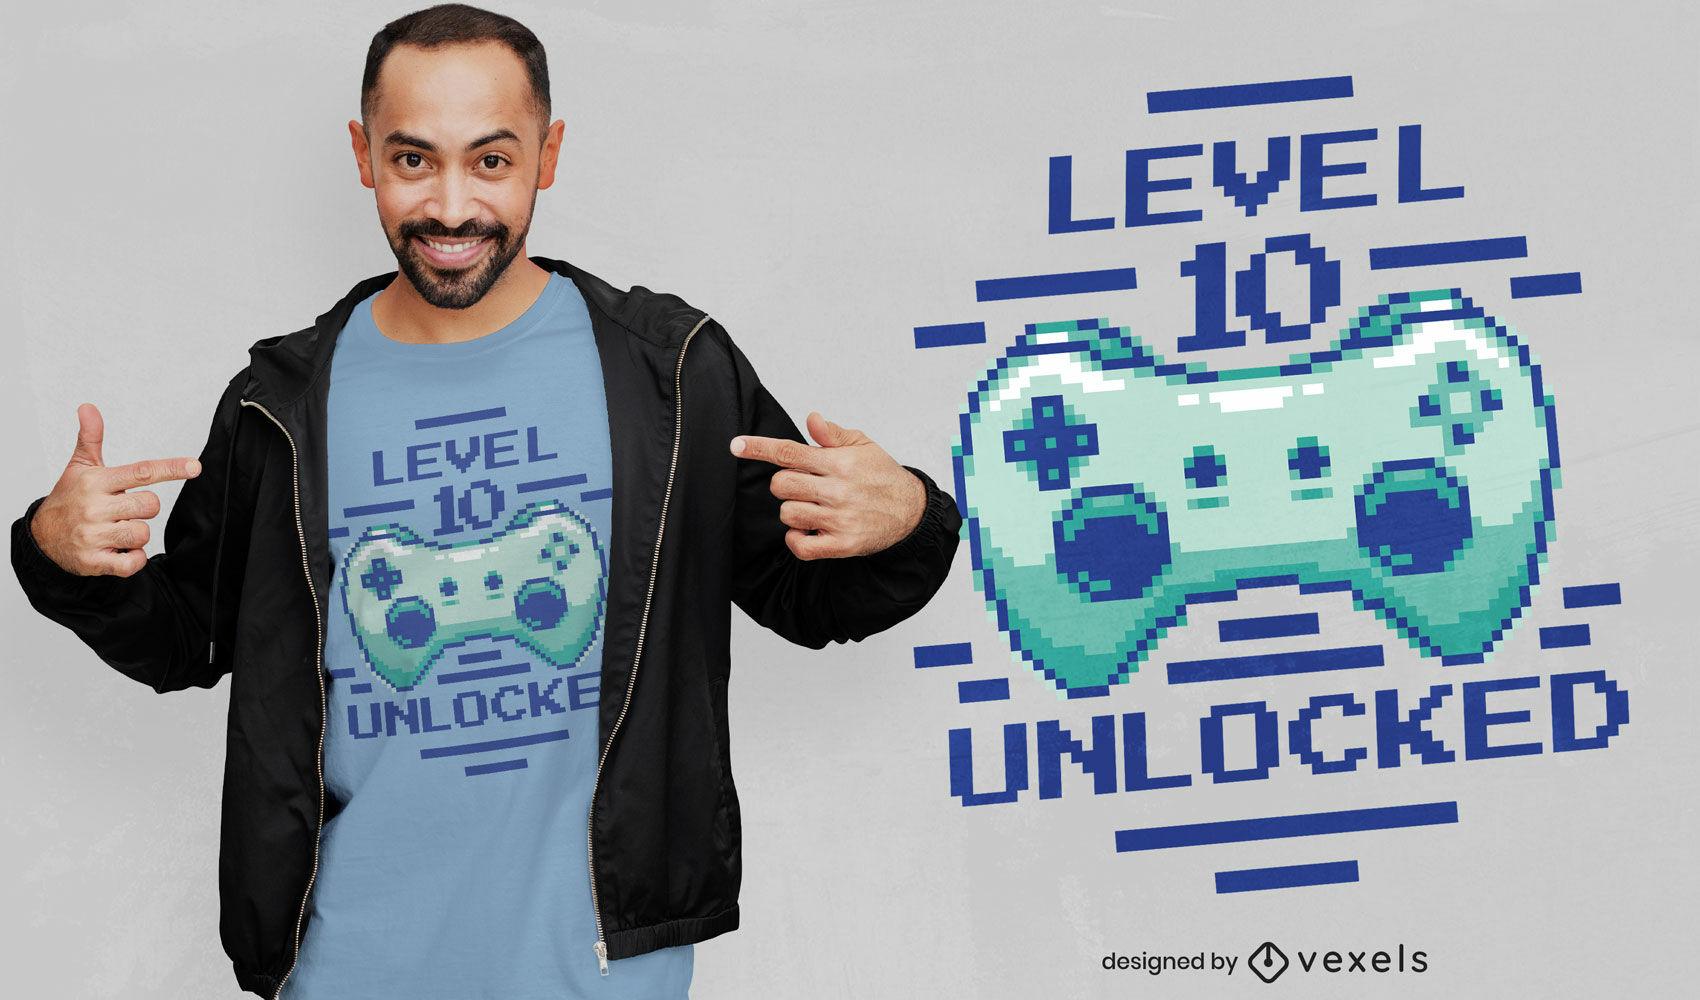 Dise?o de camiseta de nivel 10 de joystick